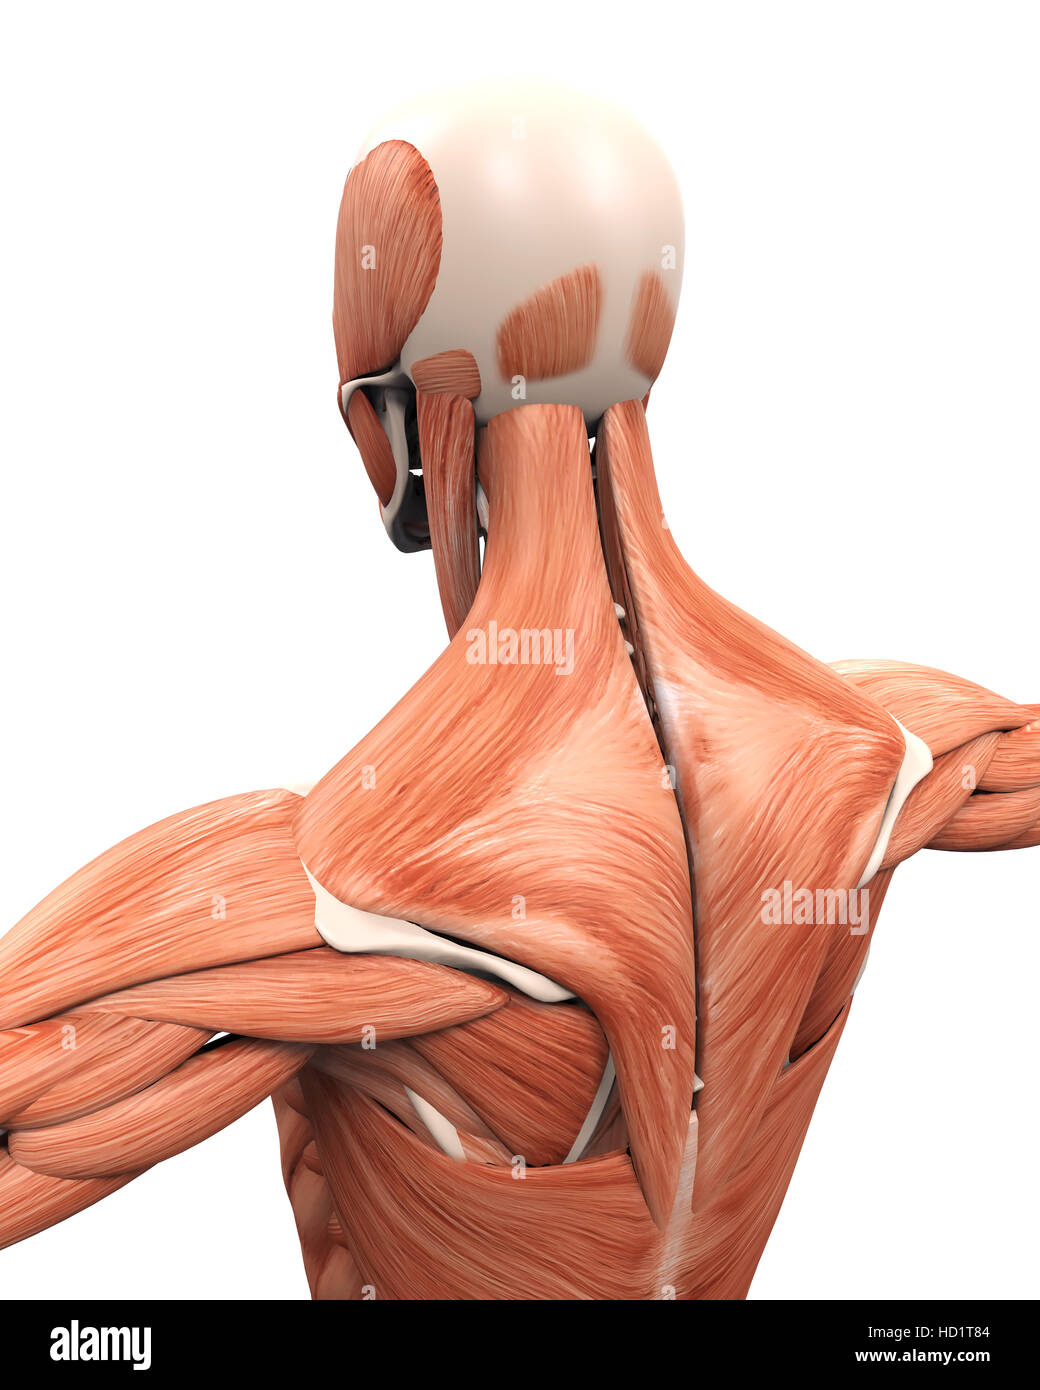 Muskuläre Anatomie des Rückens Stockfoto, Bild: 128504100 - Alamy